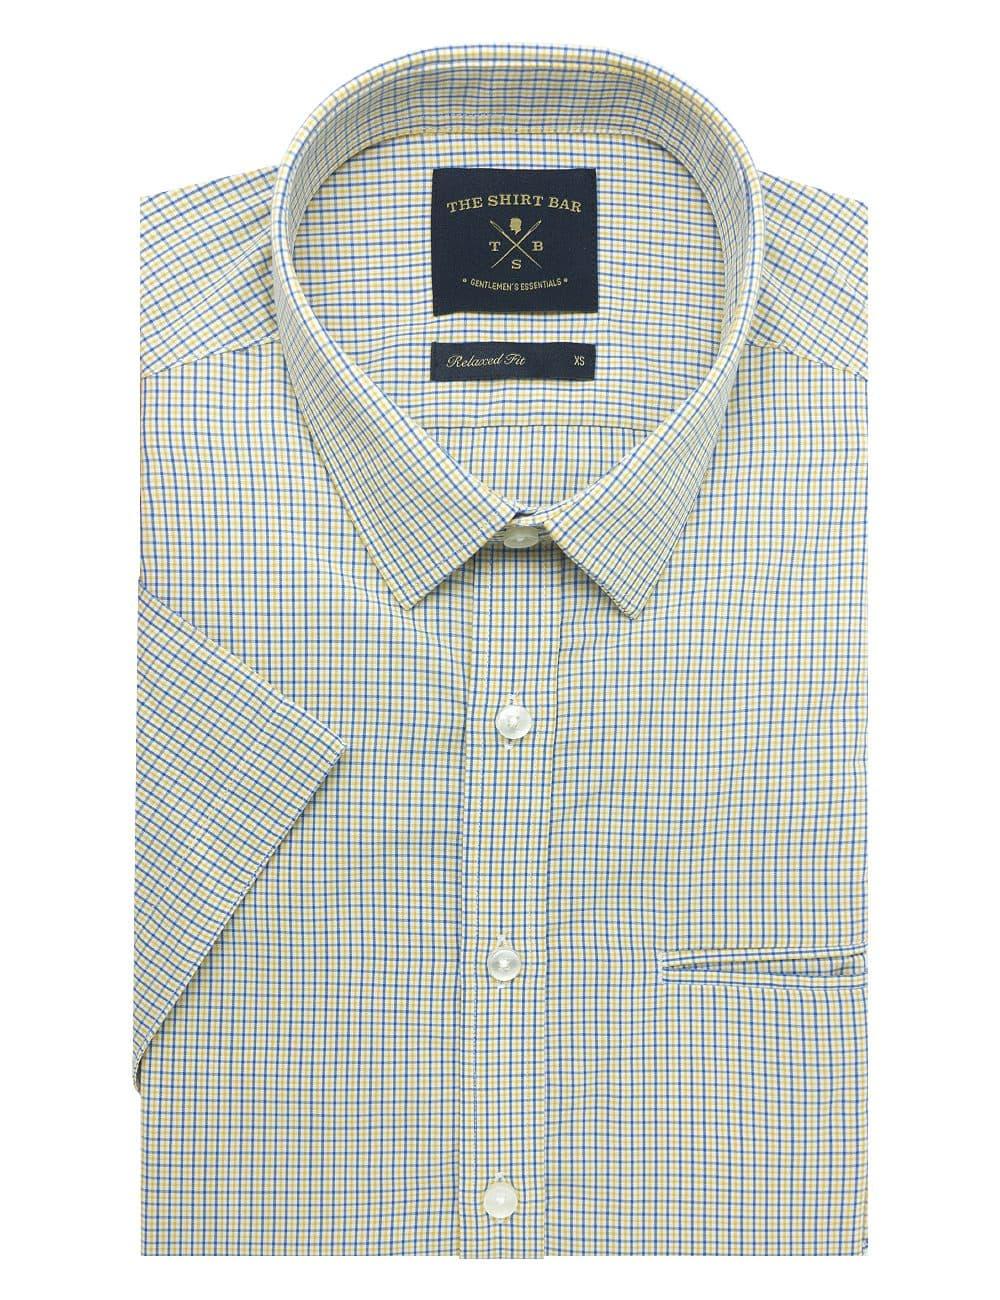 Yellow Checks Eco-ol Bamboo Custom / Relaxed Fit Short Sleeve Shirt – RF9SNB20.19